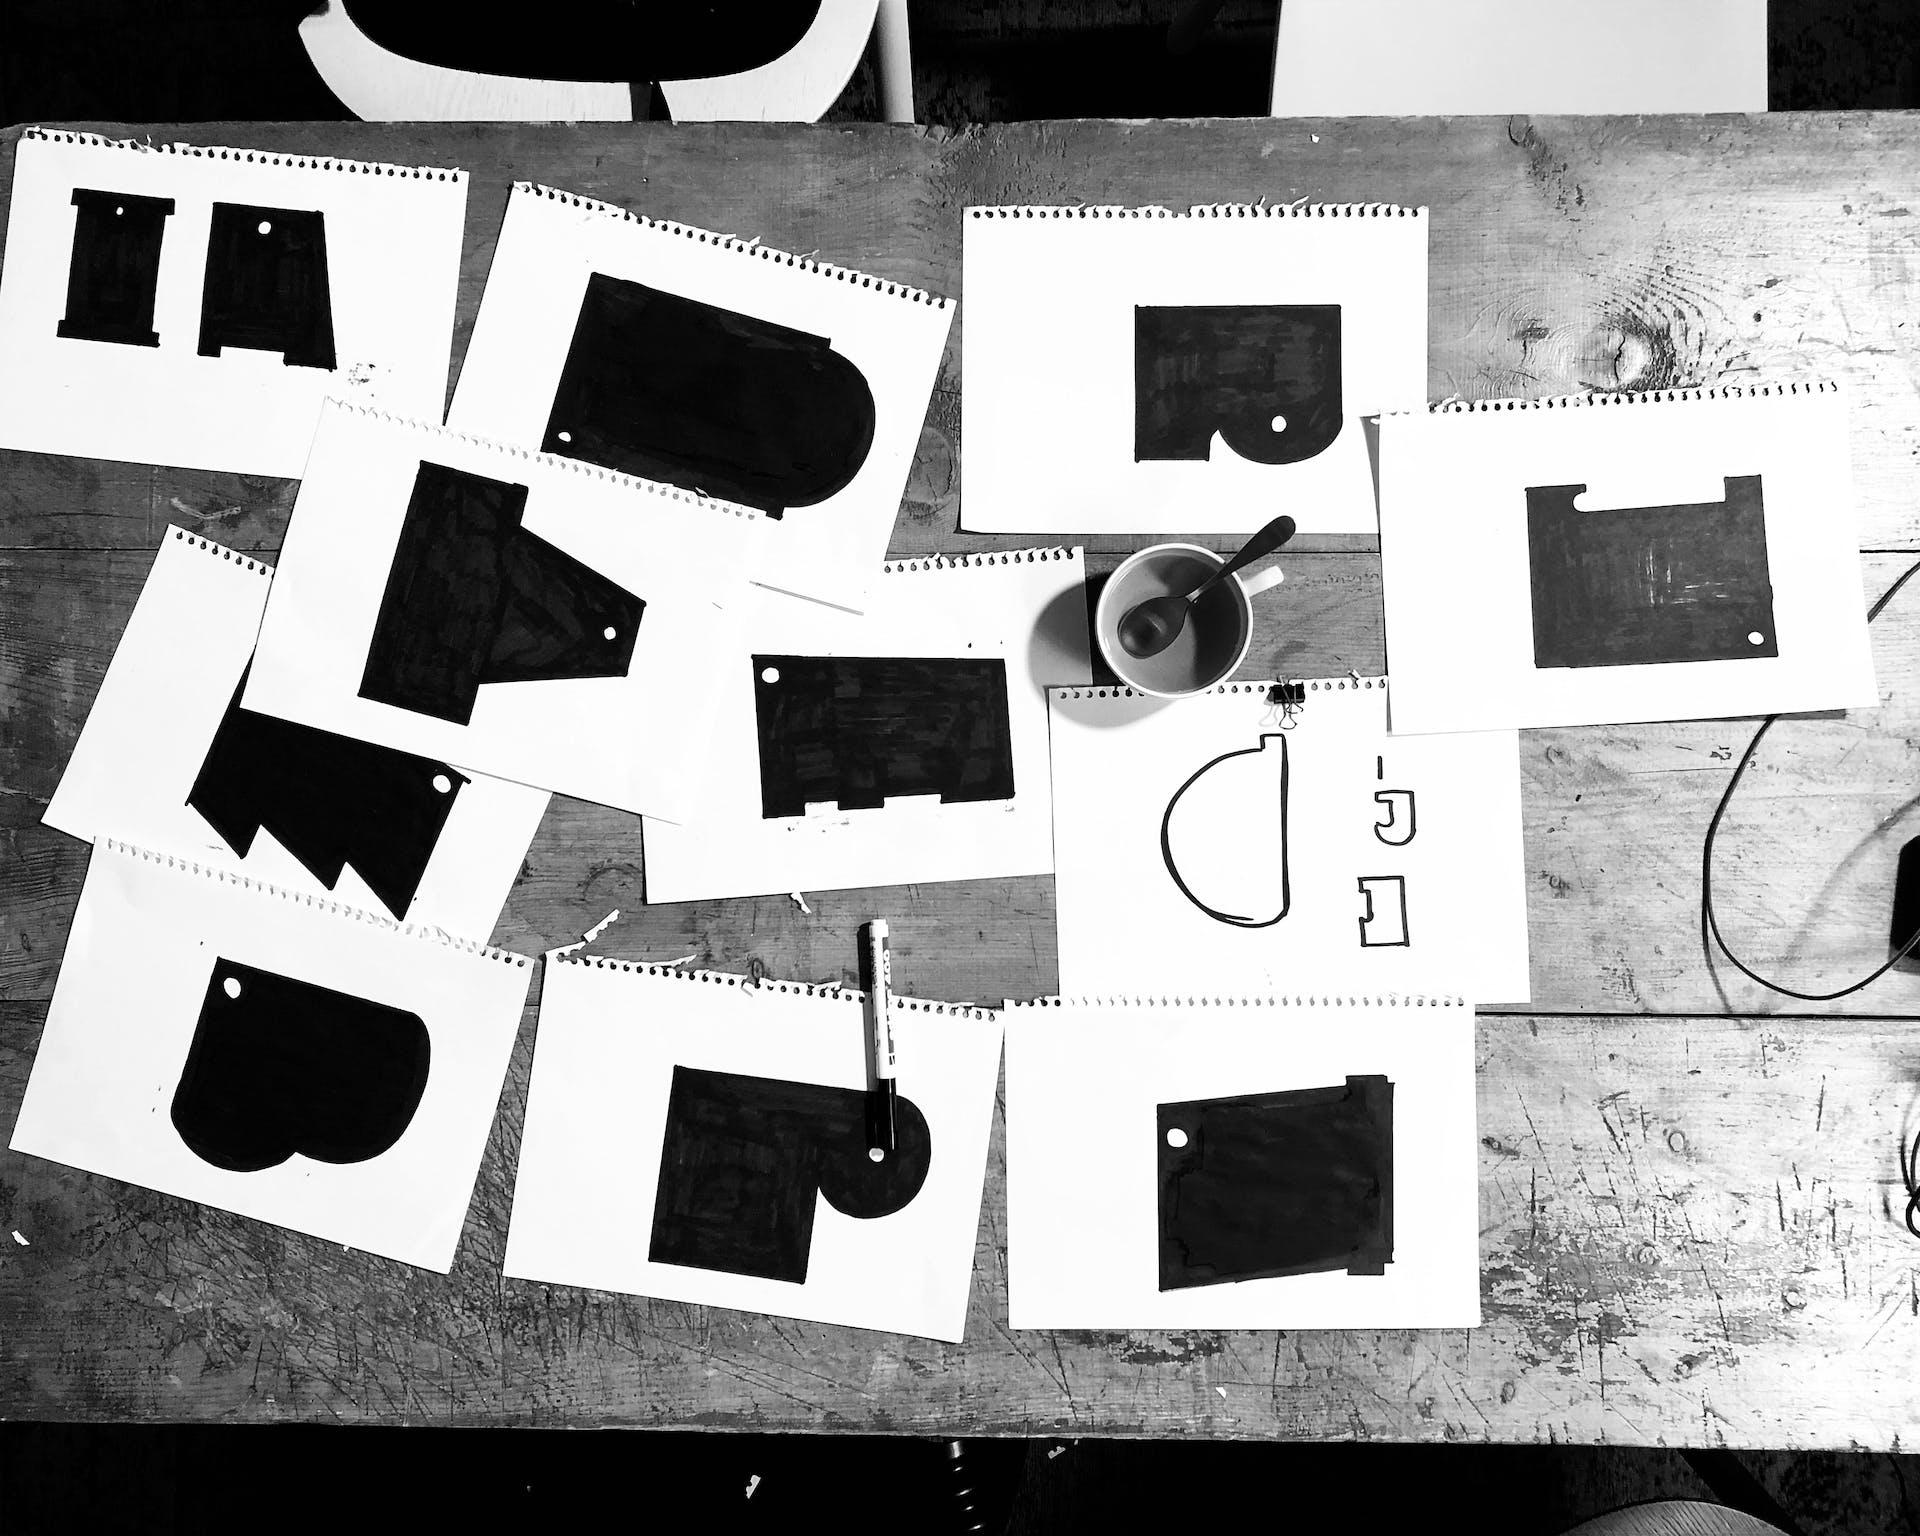 Studio Fabio Biesel